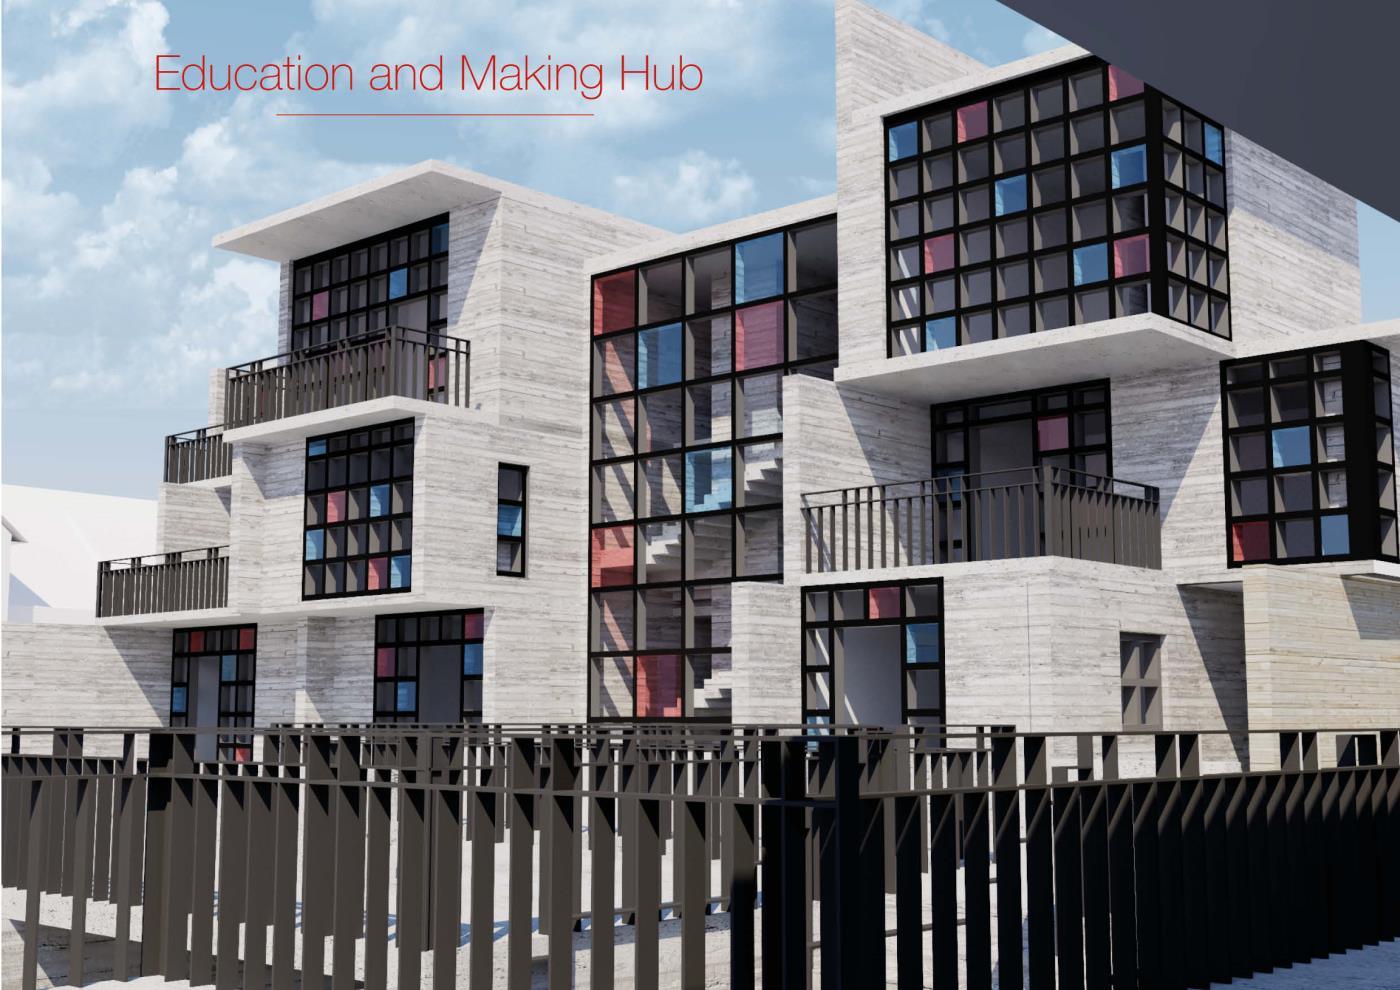 Education and Making Hub